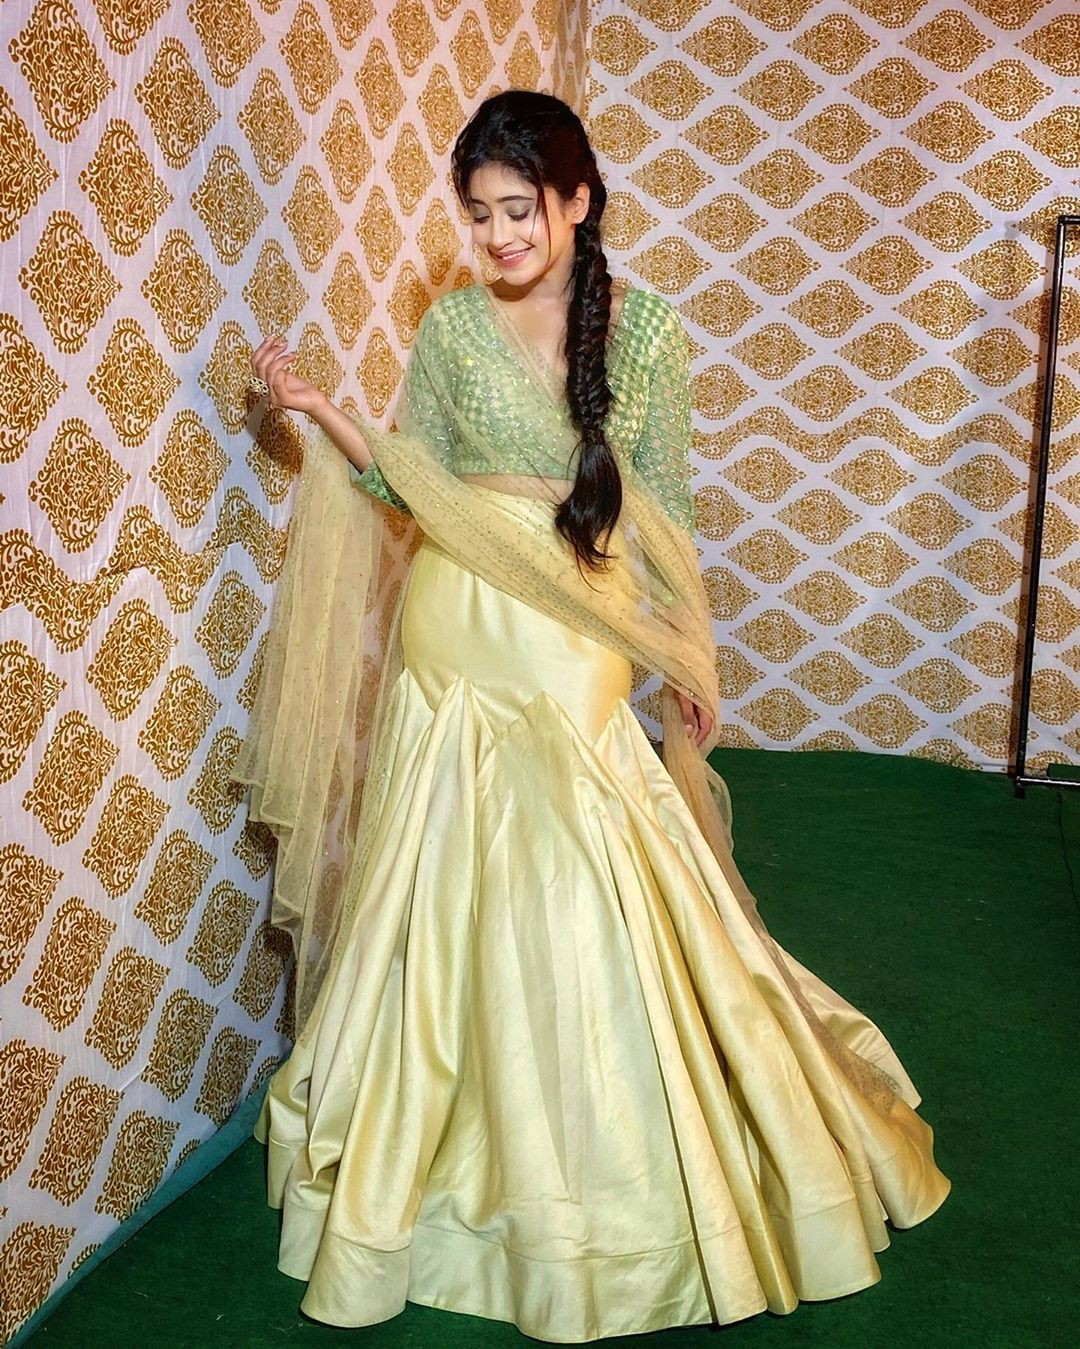 Yellow and green dress, gown formal wear, silk, sari